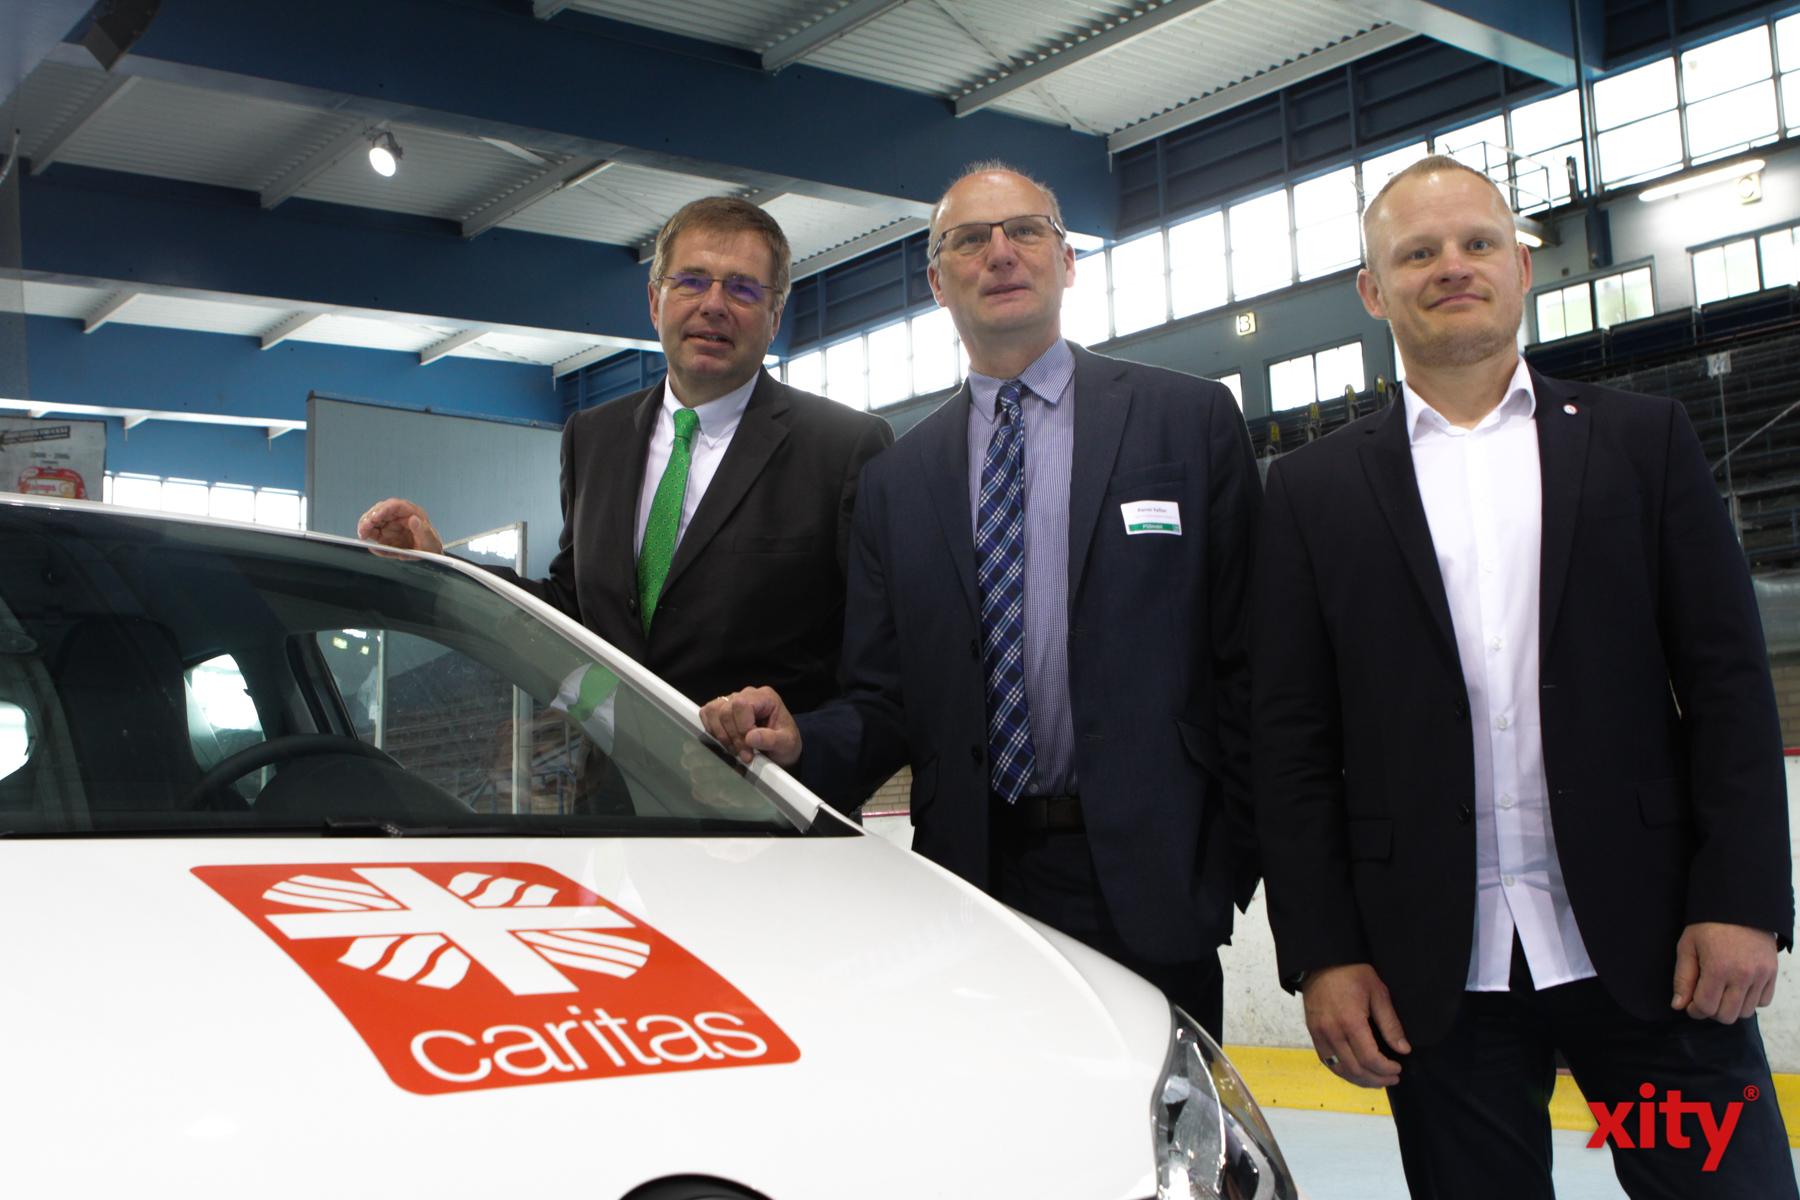 Das Team der Hospizdienste Caritas Wuppertal/Solingen (Foto: xity)